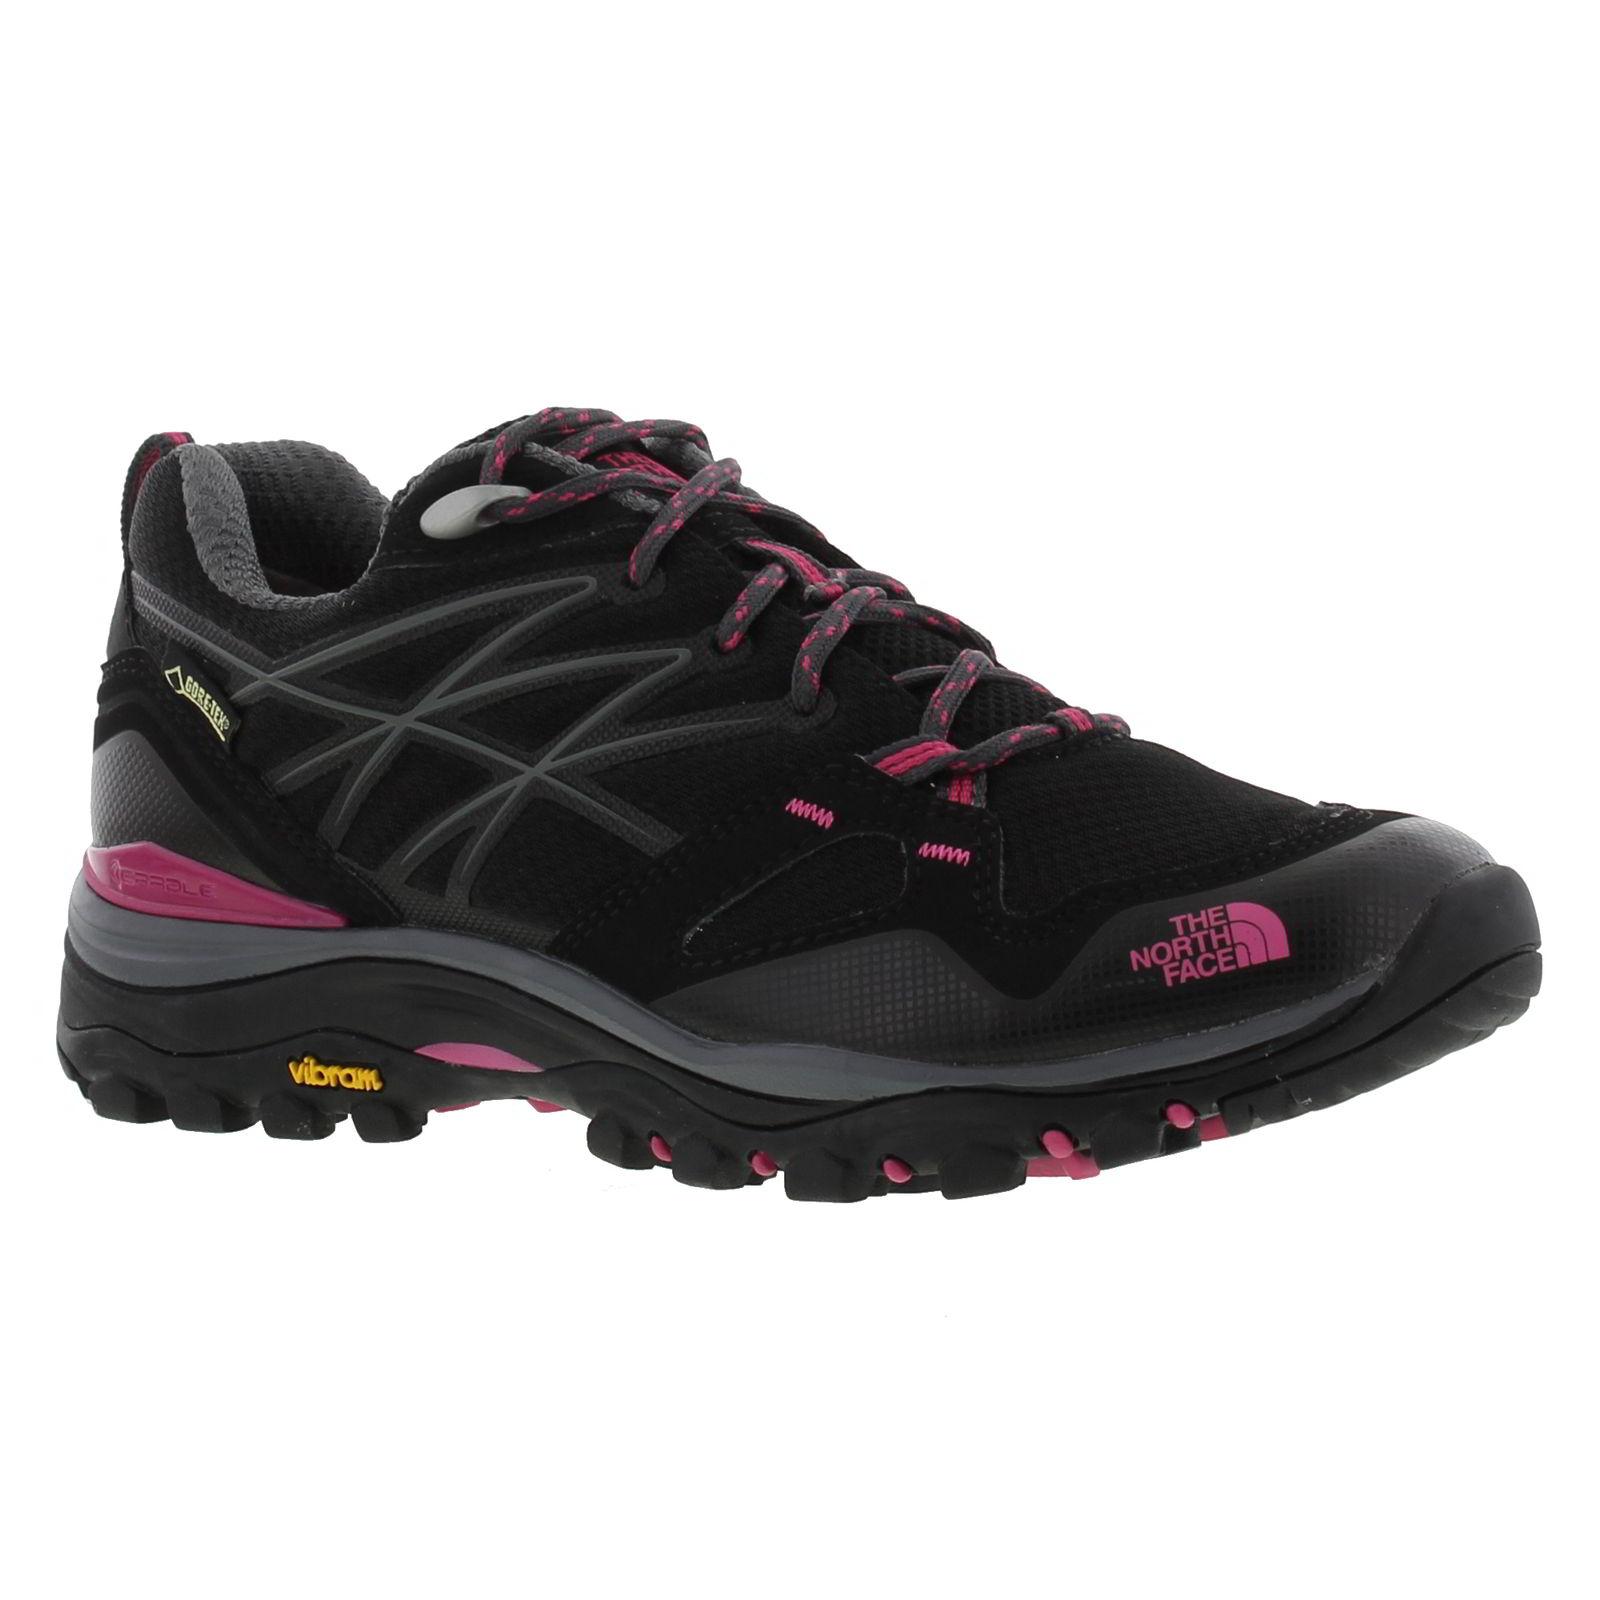 Womens Goretex North Face Shoes Uk Sale